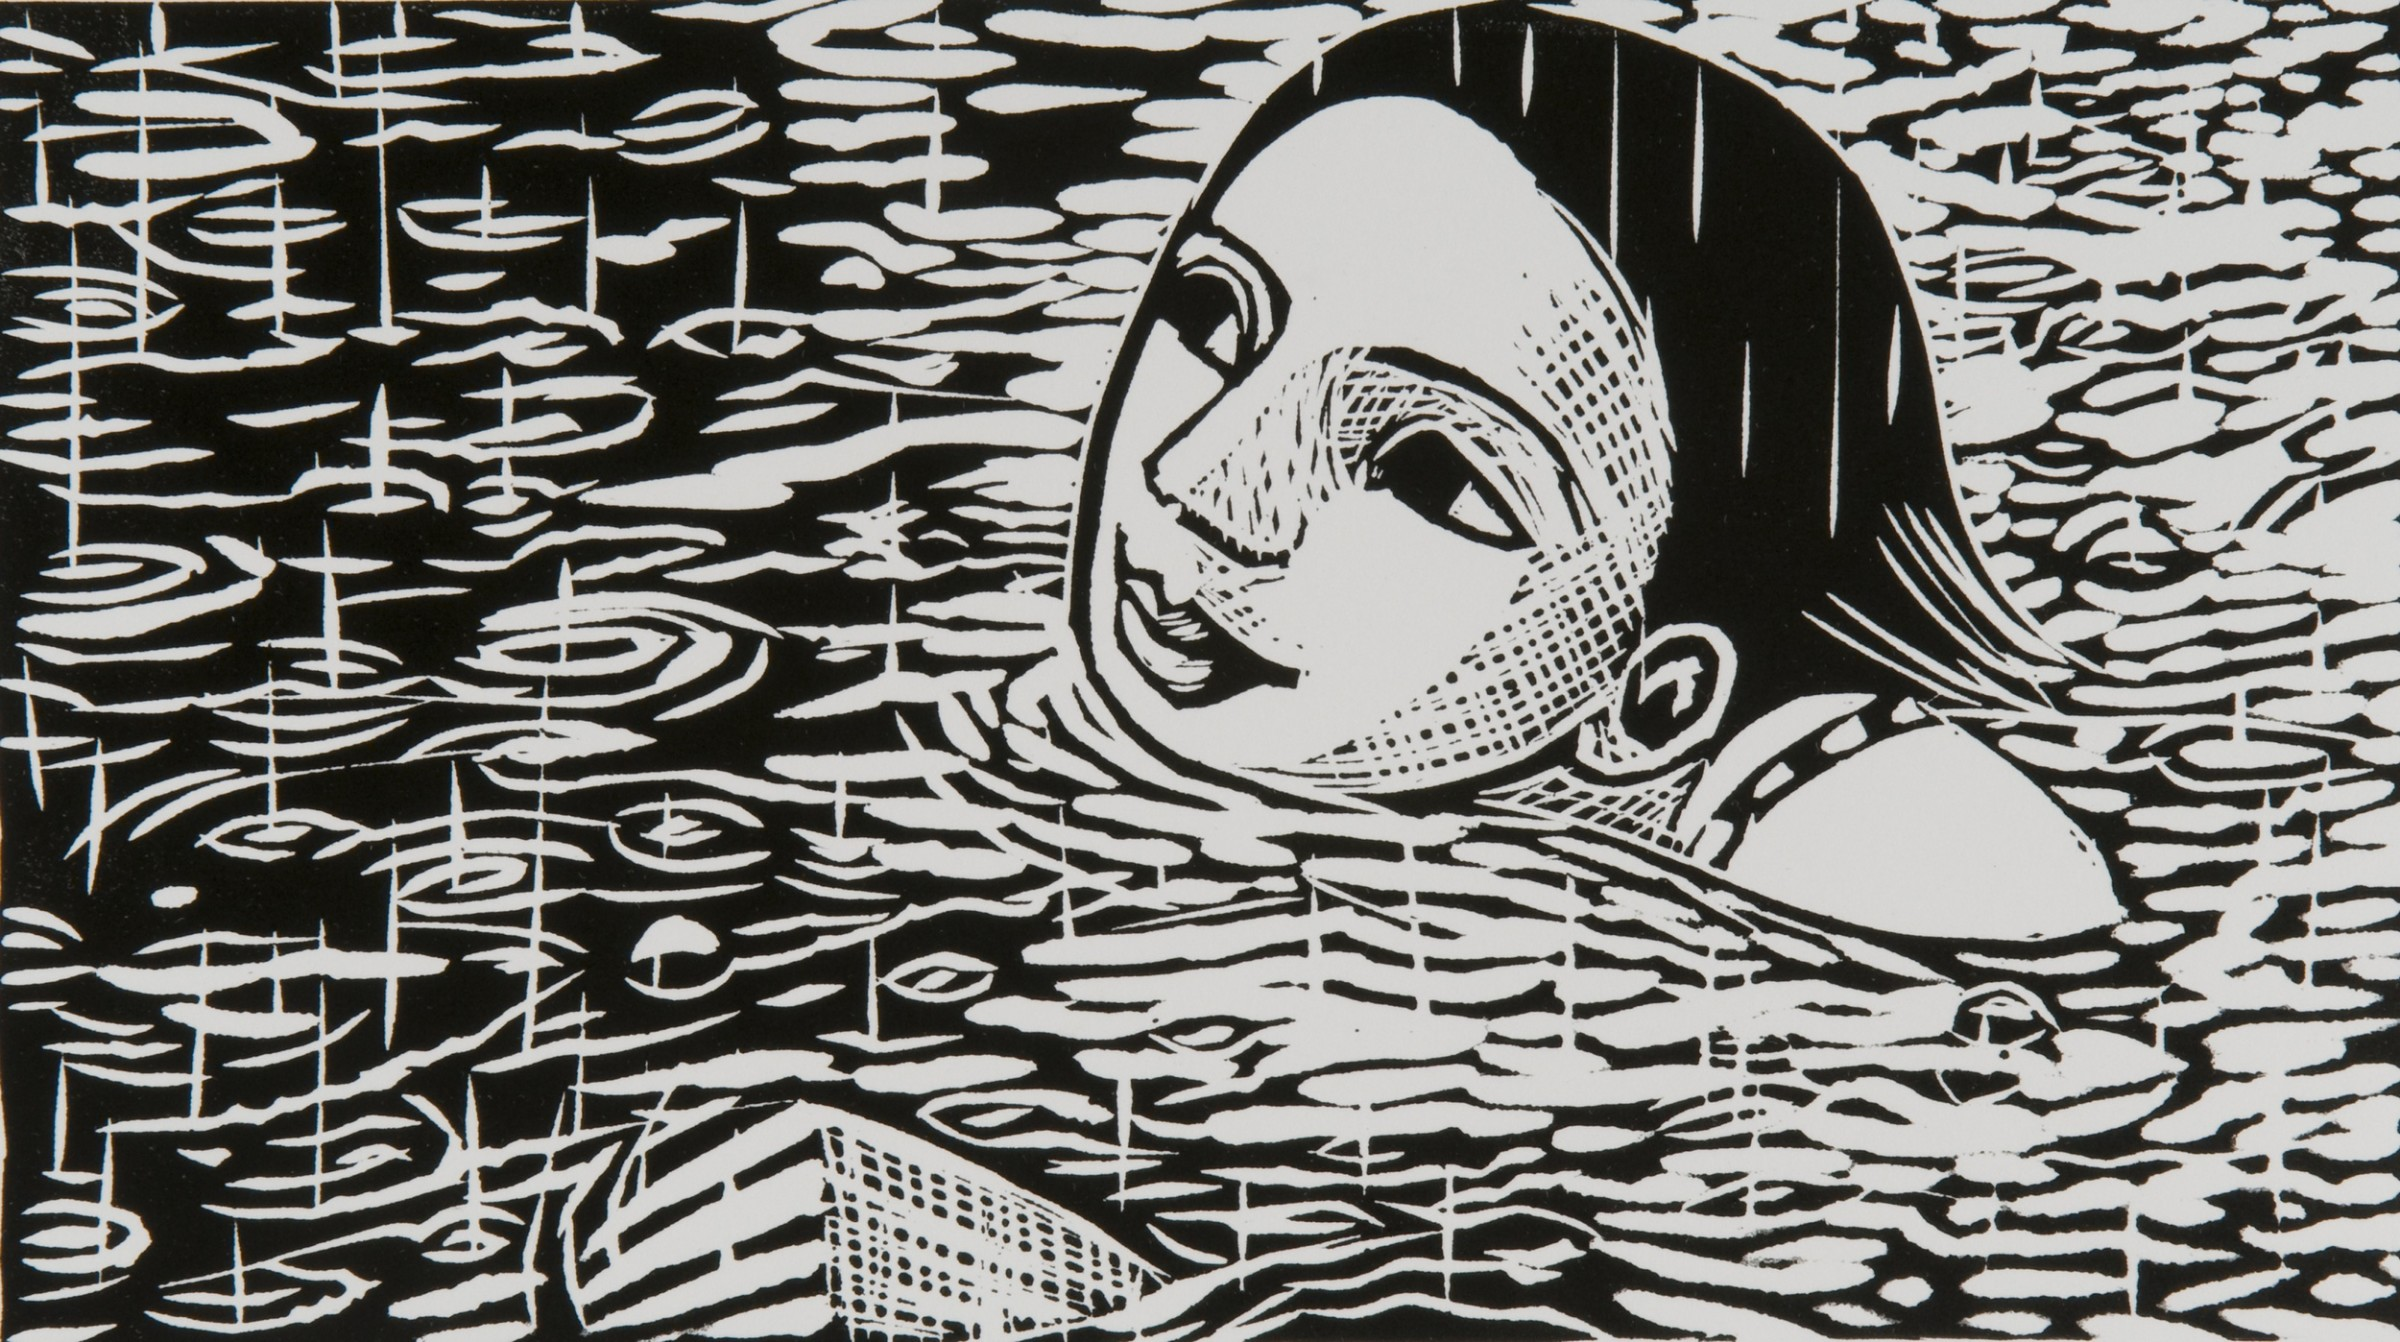 "<span class=""link fancybox-details-link""><a href=""/exhibitions/22/works/artworks_standalone11064/"">View Detail Page</a></span><div class=""artist""><span class=""artist""><strong>Anita Klein PPRE Hon RWS</strong></span></div><div class=""title""><em>Swimming in the Rain</em></div><div class=""medium"">linocut</div><div class=""dimensions"">31 x 41 cm framed size<br>15 x 26 cm image size</div><div class=""edition_details"">edition of 100</div>"